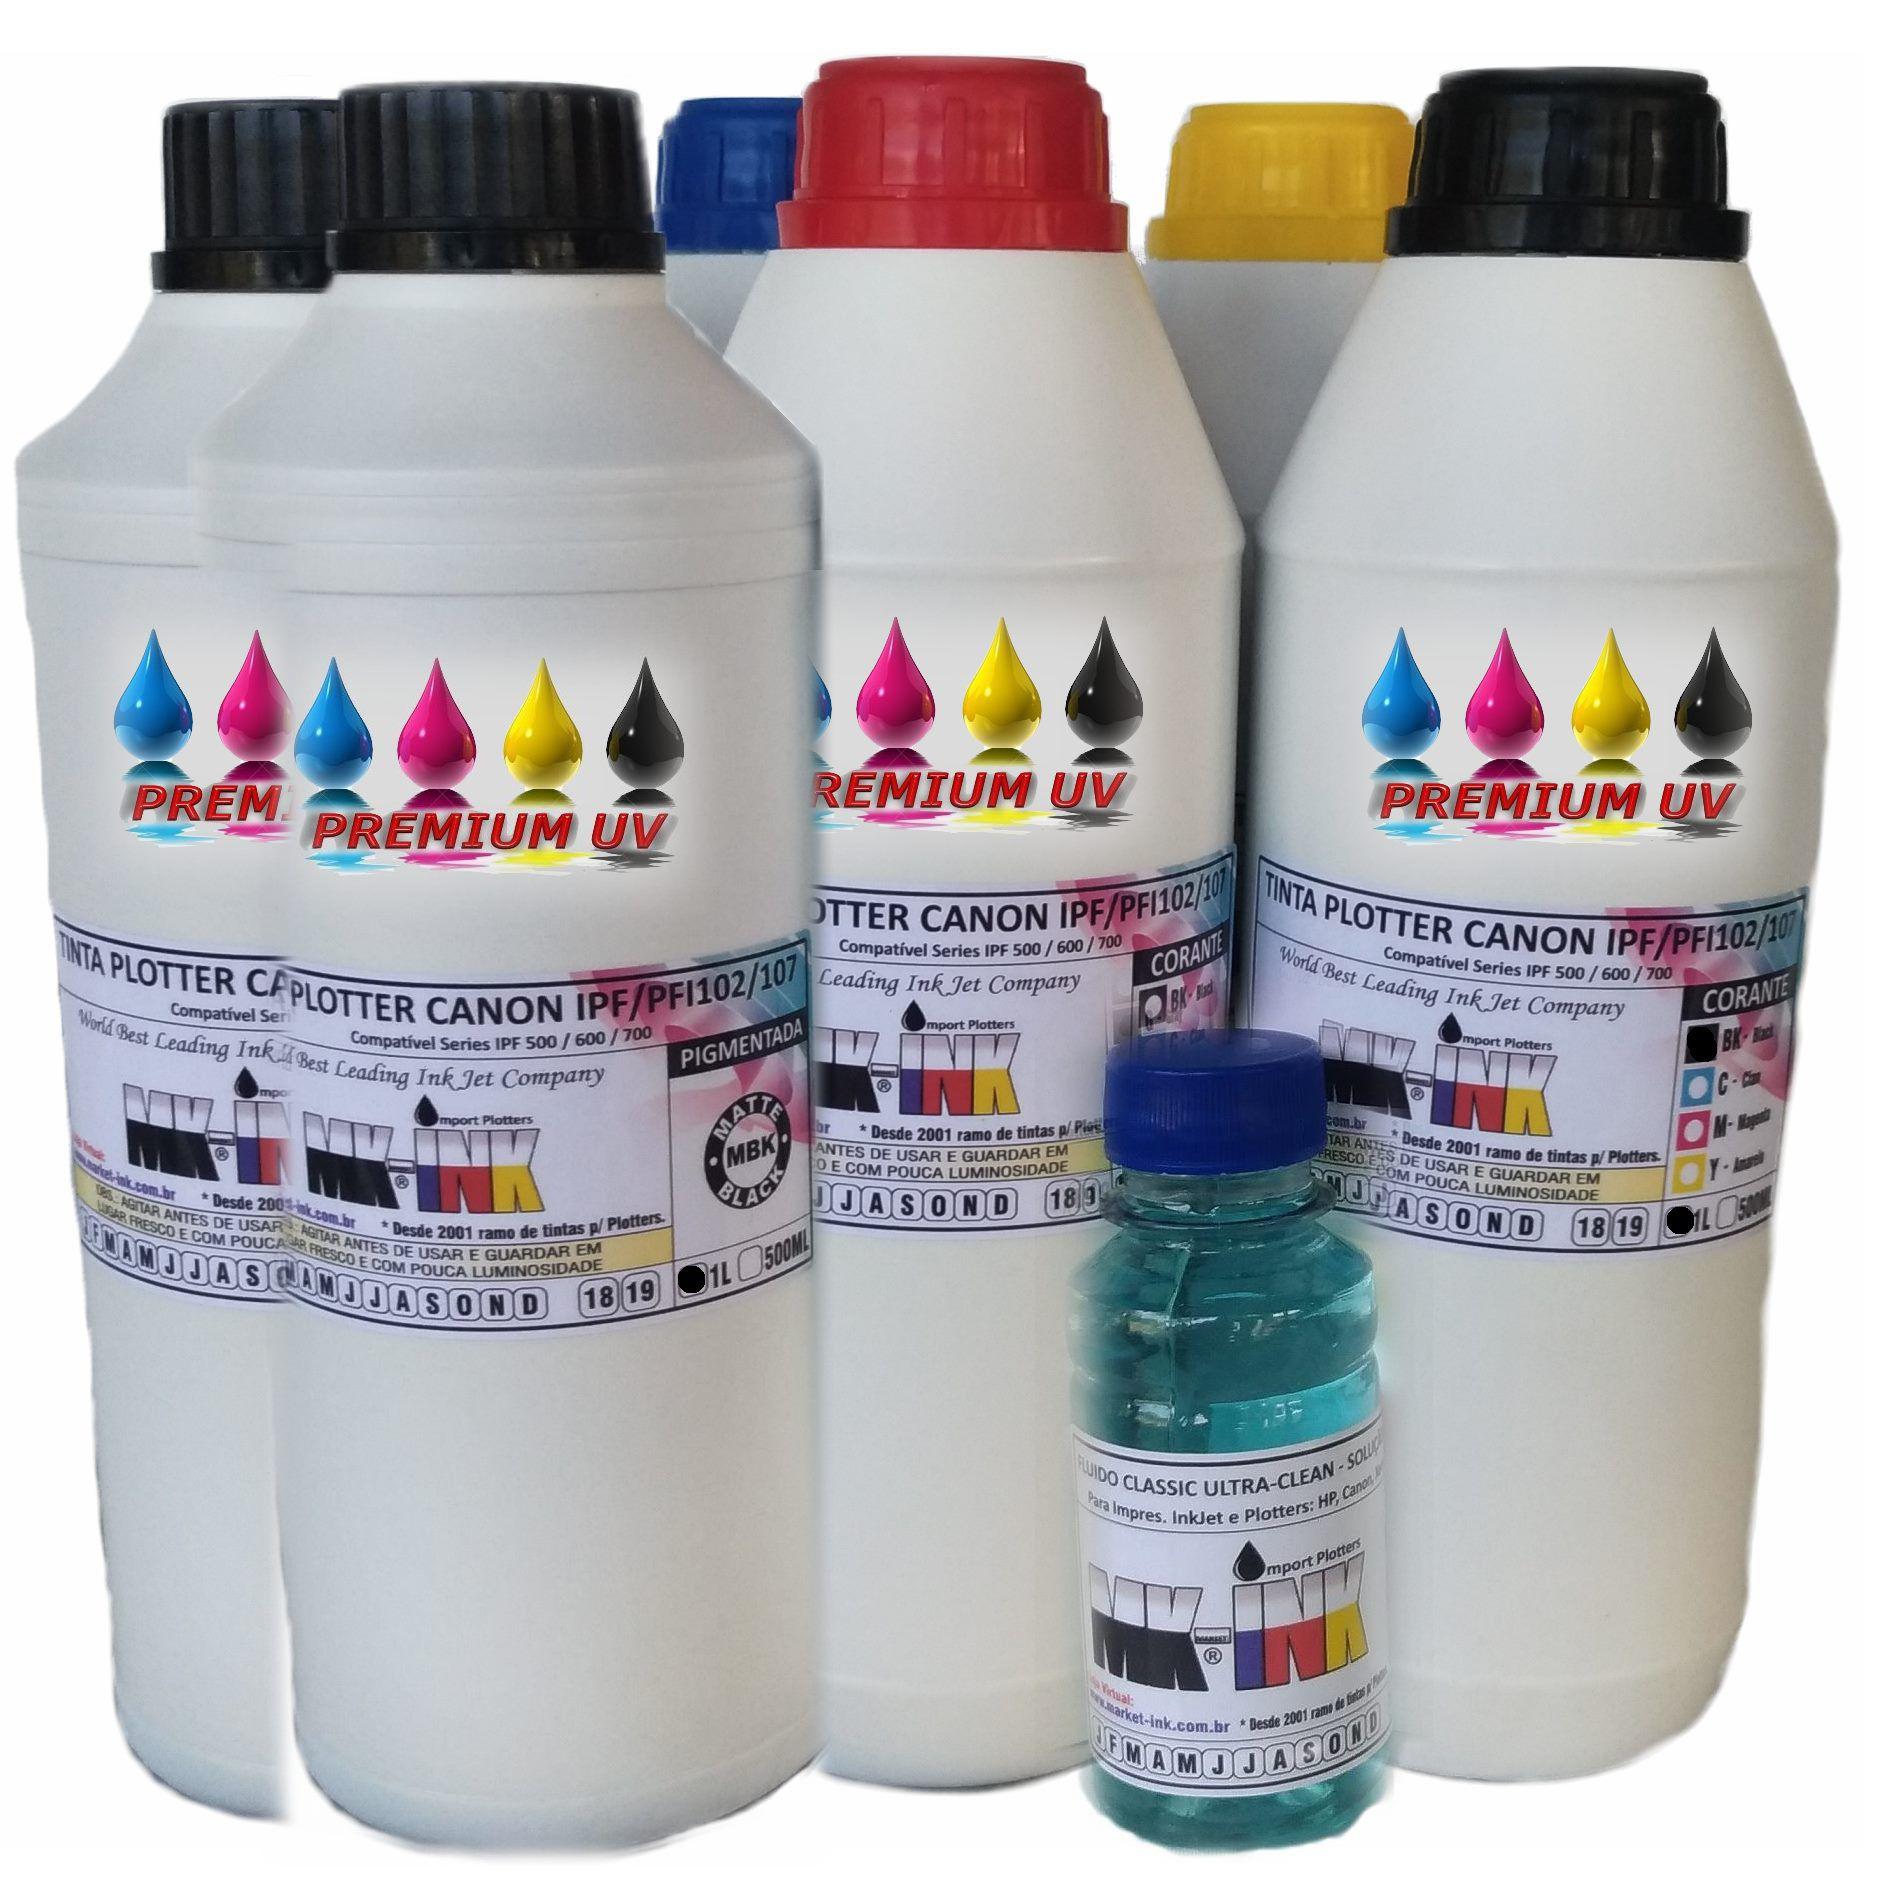 Jogo 5 ou 6 litrs Tinta Premium Plotters Canon IPF Serie 500, 600, 700, que utilizam códigos PFI-102, PF-107, PFI-007